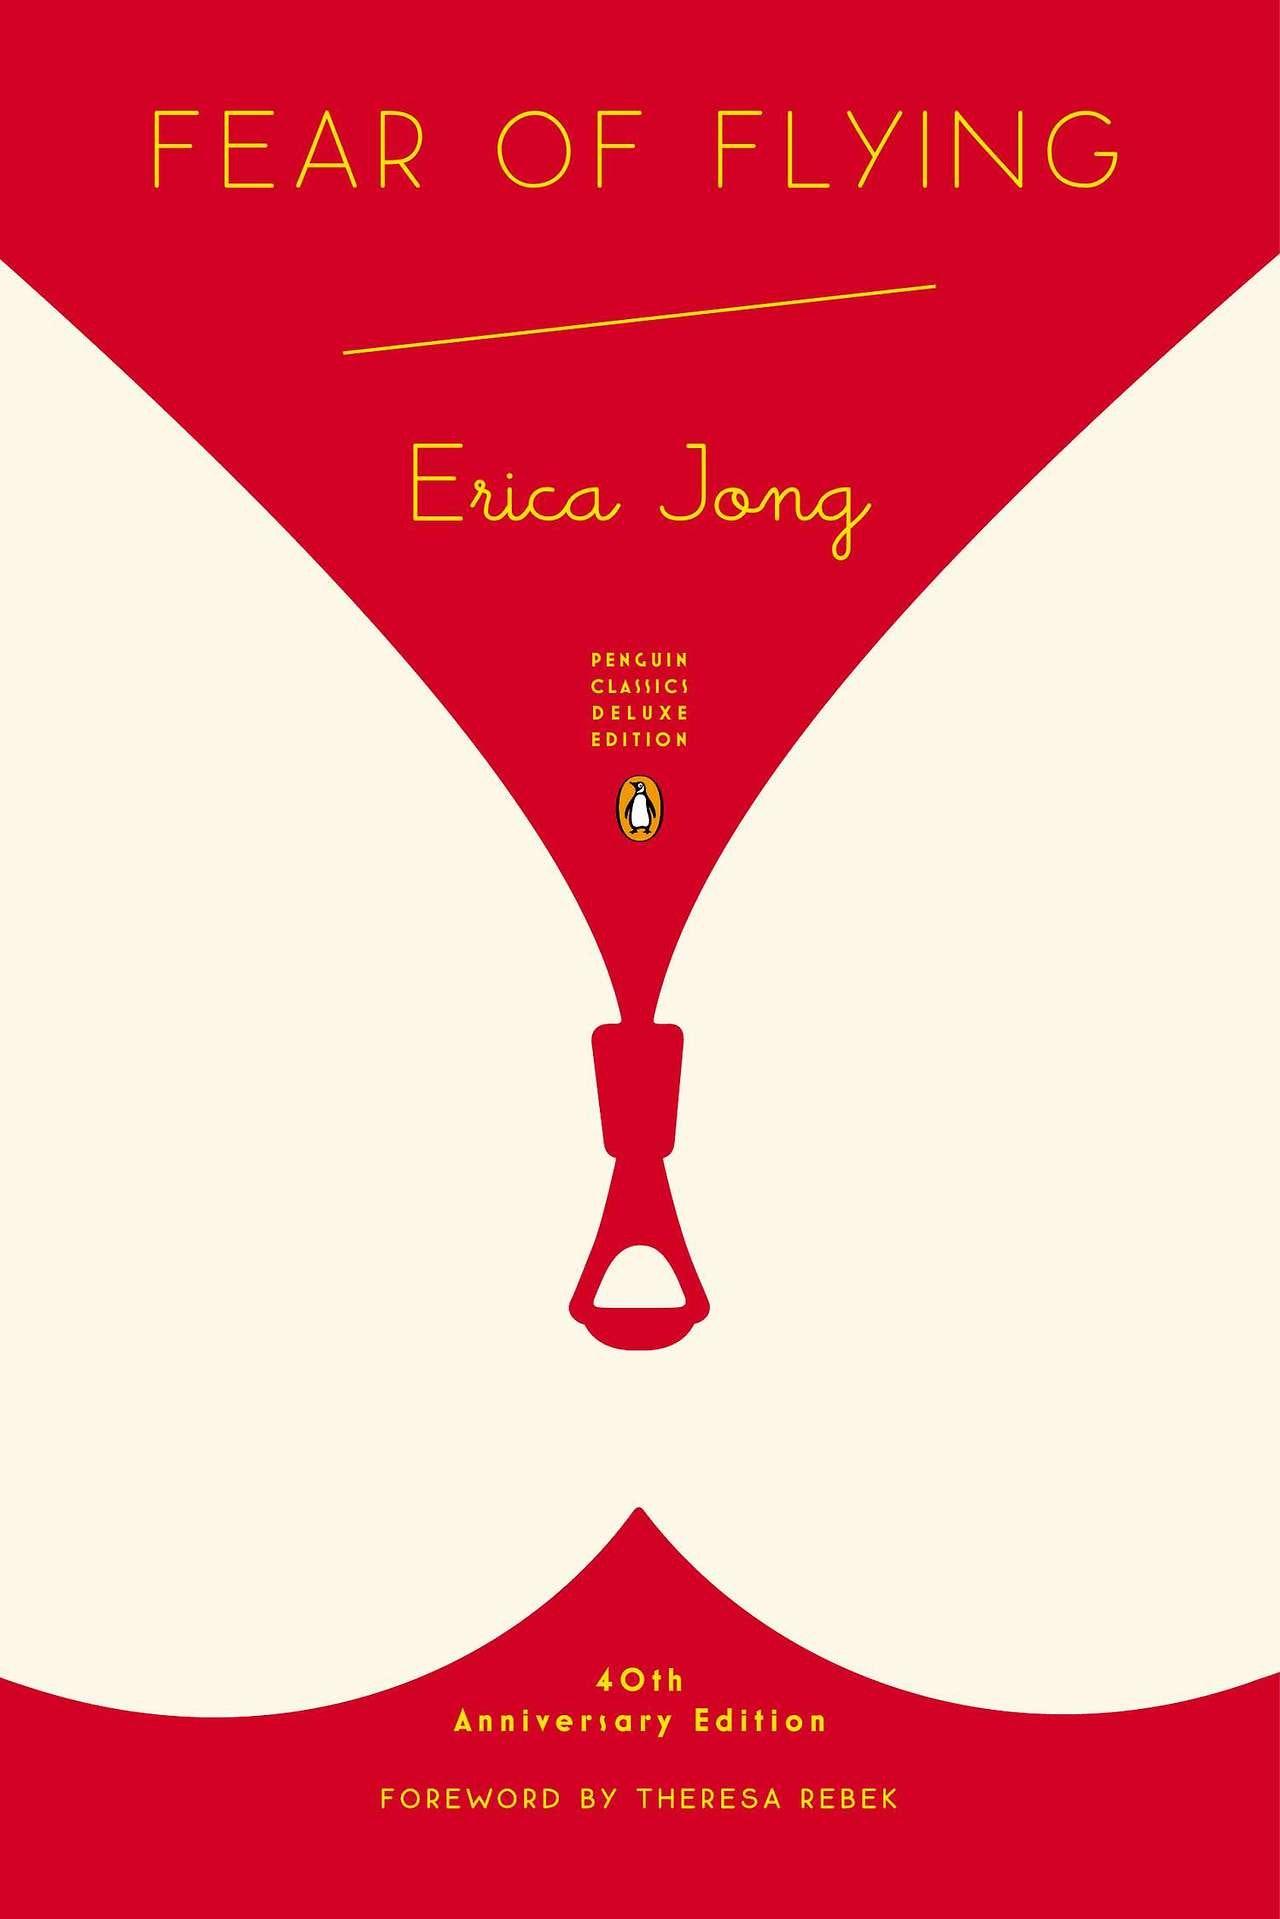 Novels about either marxism, feminism, symbols or metaphor?